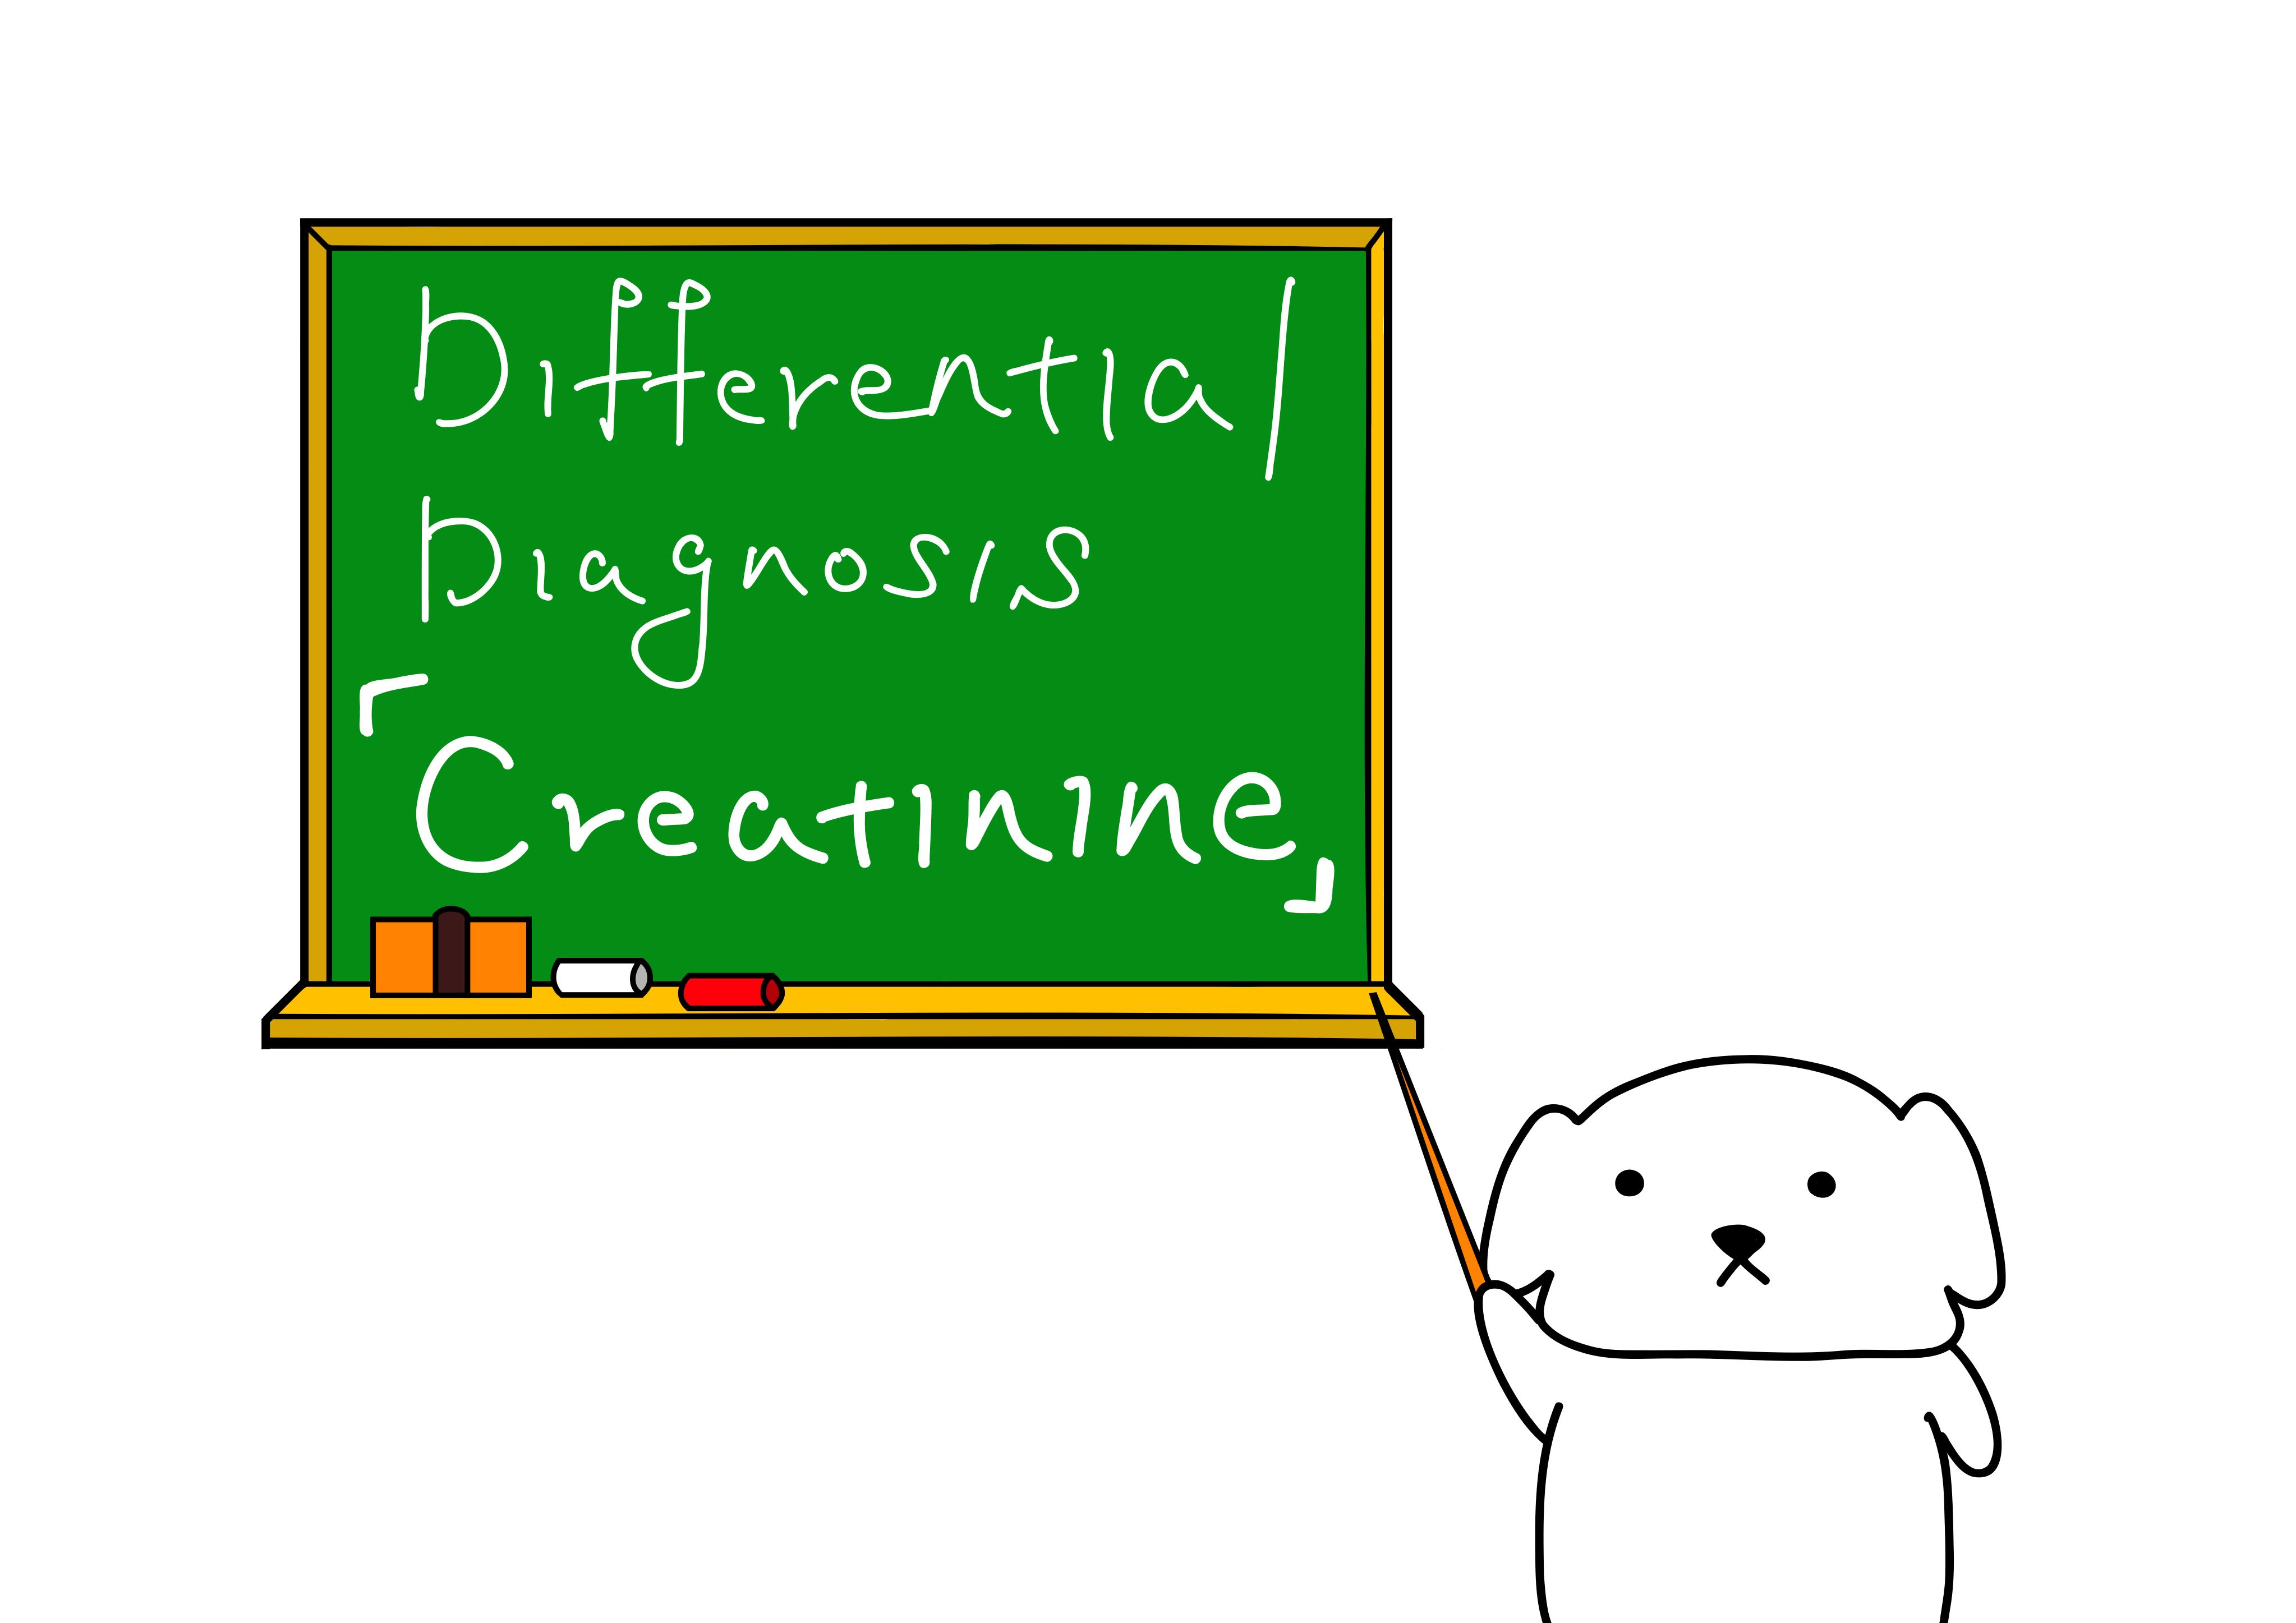 creatinine-title